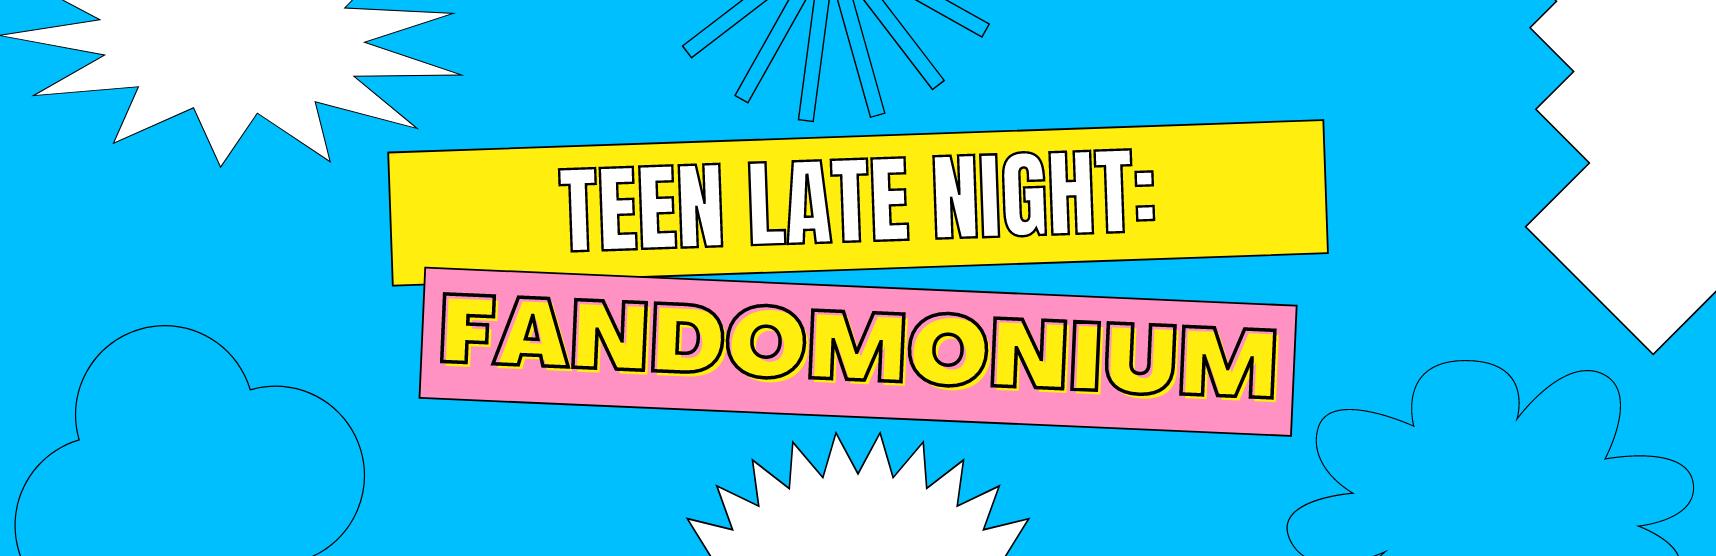 Teen Late Night: Fandomonium